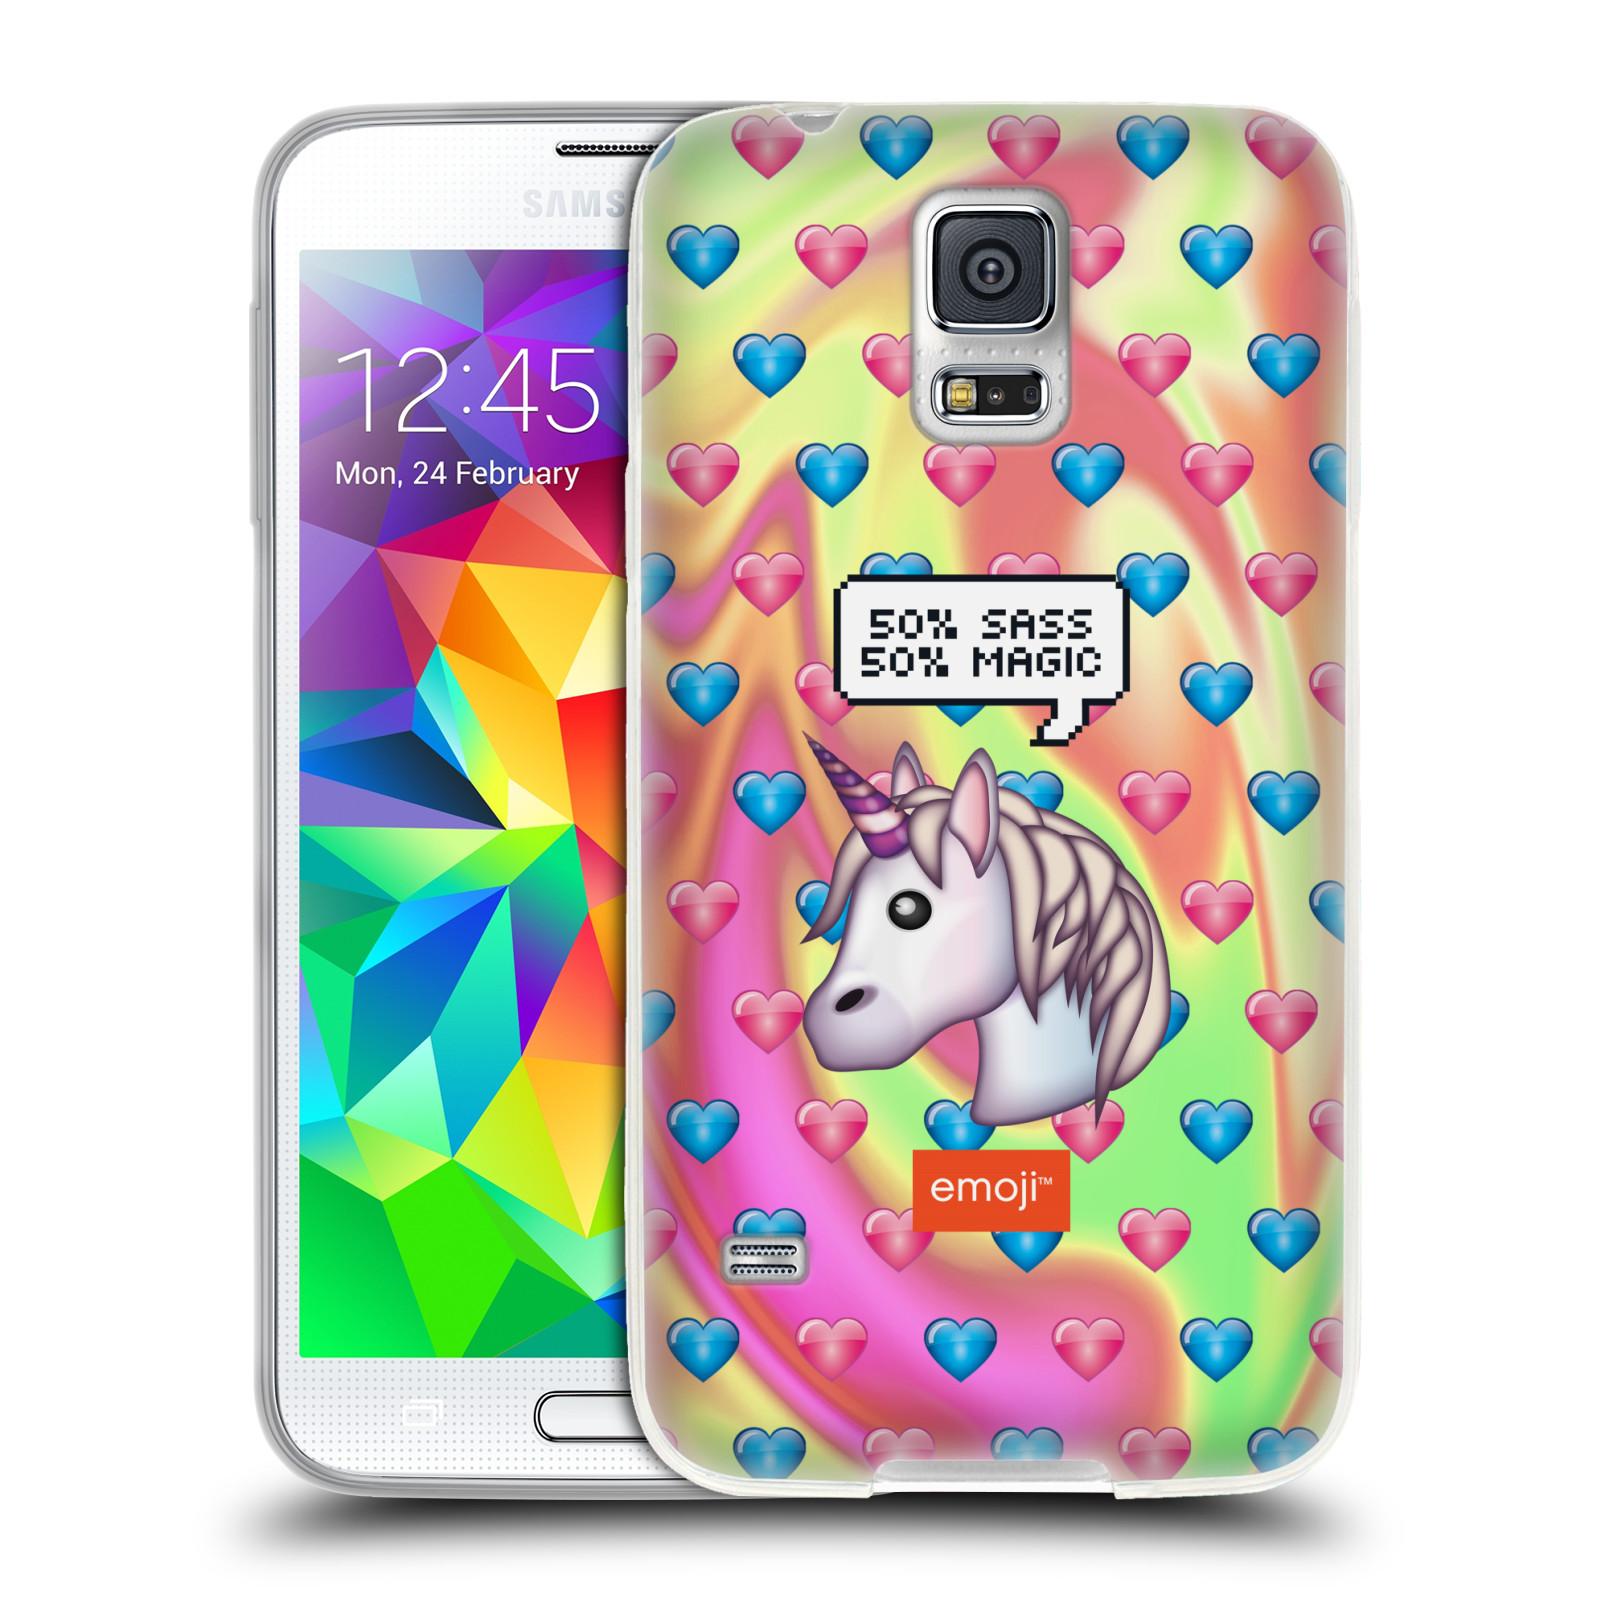 Silikonové pouzdro na mobil Samsung Galaxy S5 HEAD CASE EMOJI - Jednorožec (Silikonový kryt či obal s oficiálním motivem EMOJI na mobilní telefon Samsung Galaxy S5 SM-G900F)